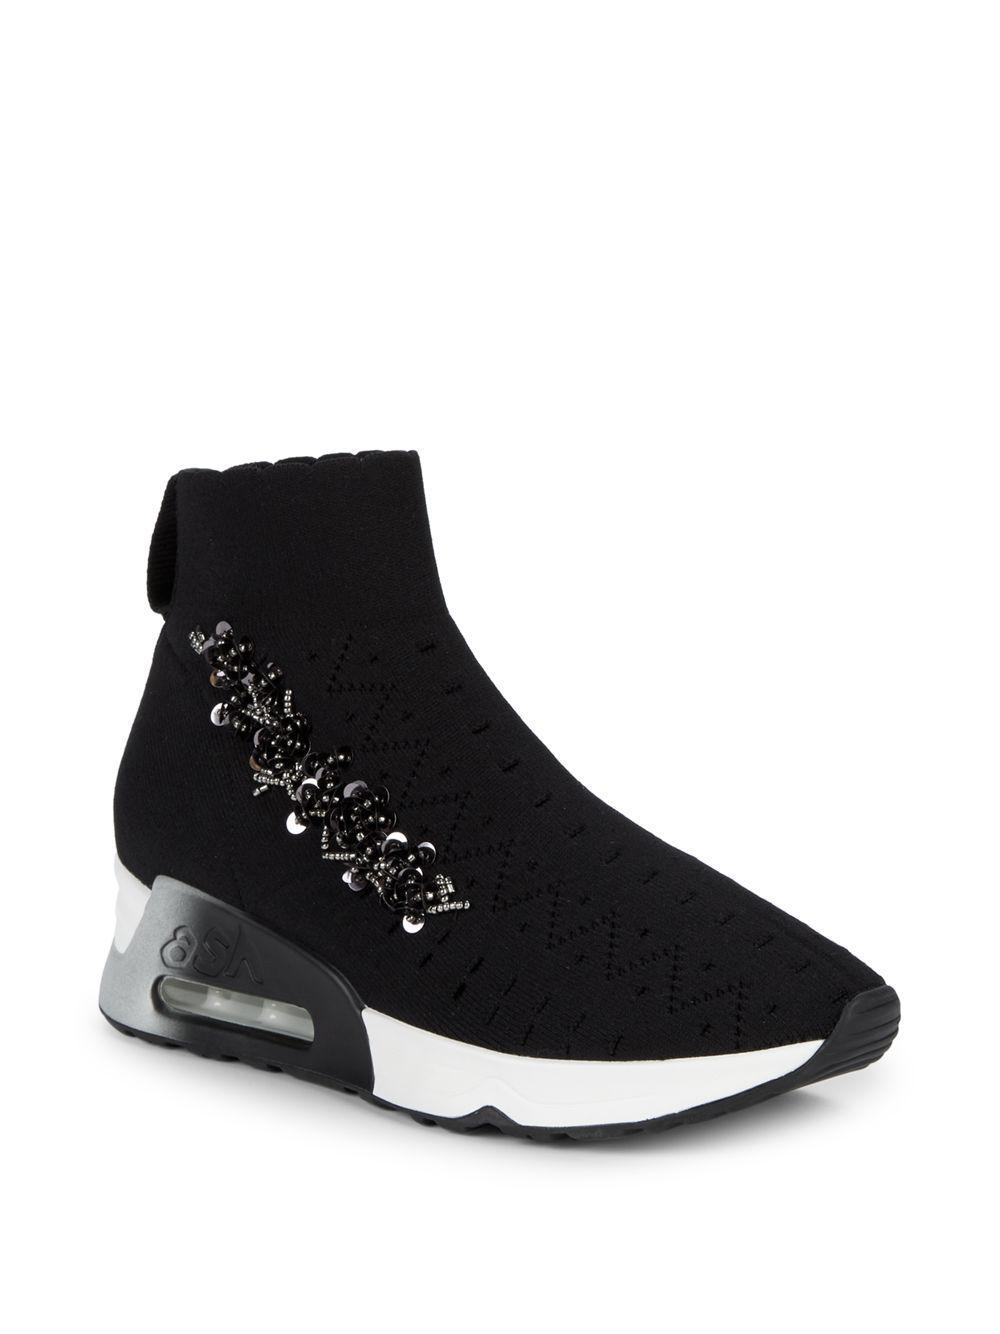 6a22babb92f39 Ash Embellished Sock Sneakers in Black - Lyst